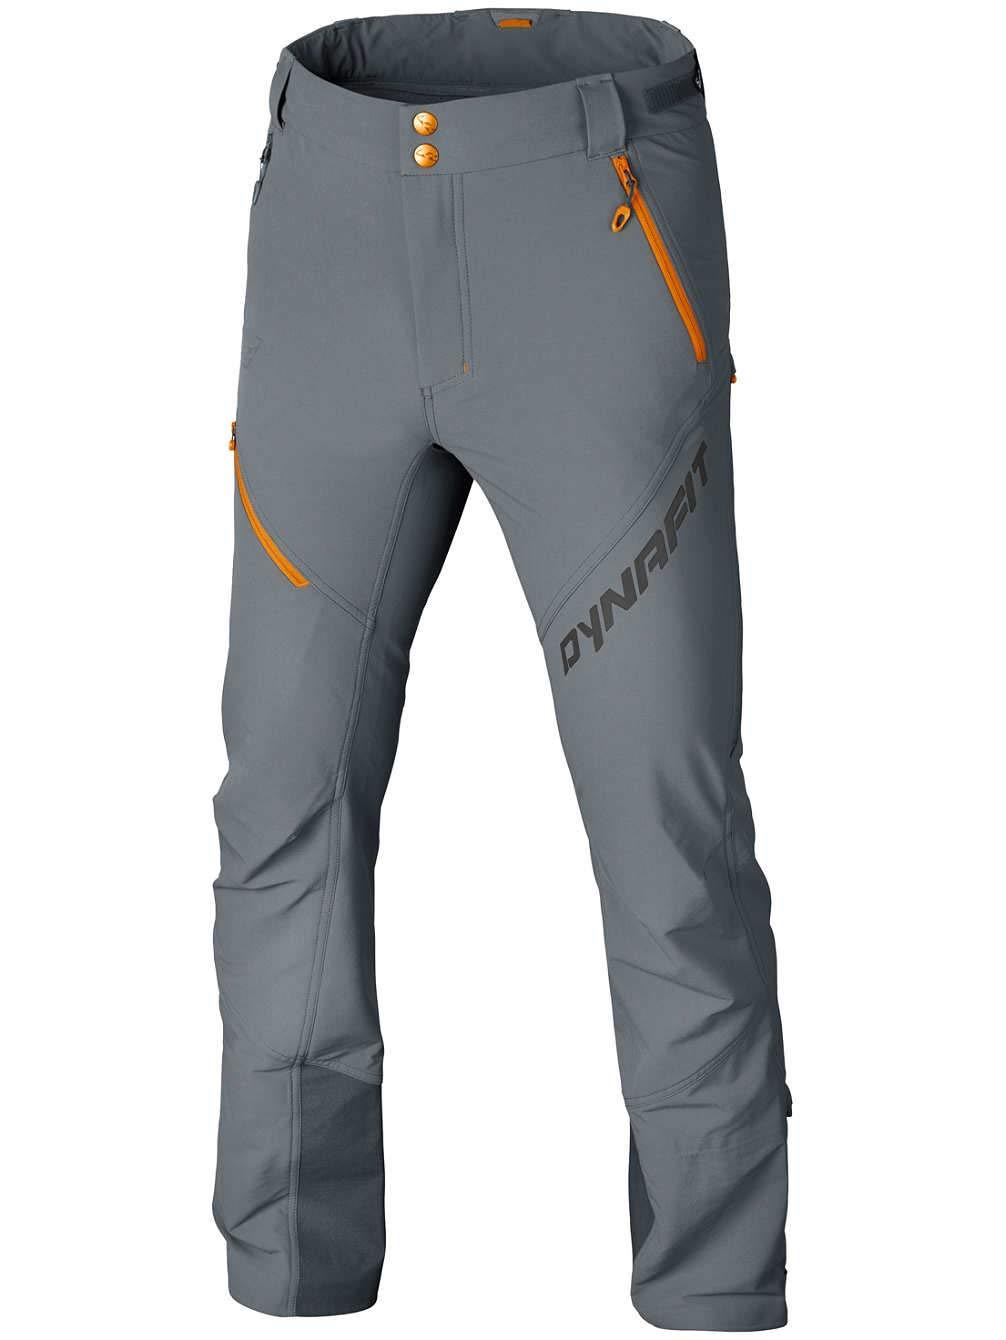 Dynafit Mercury 2 DST Pantalón, Hombre, Quiet Shae, 46/S